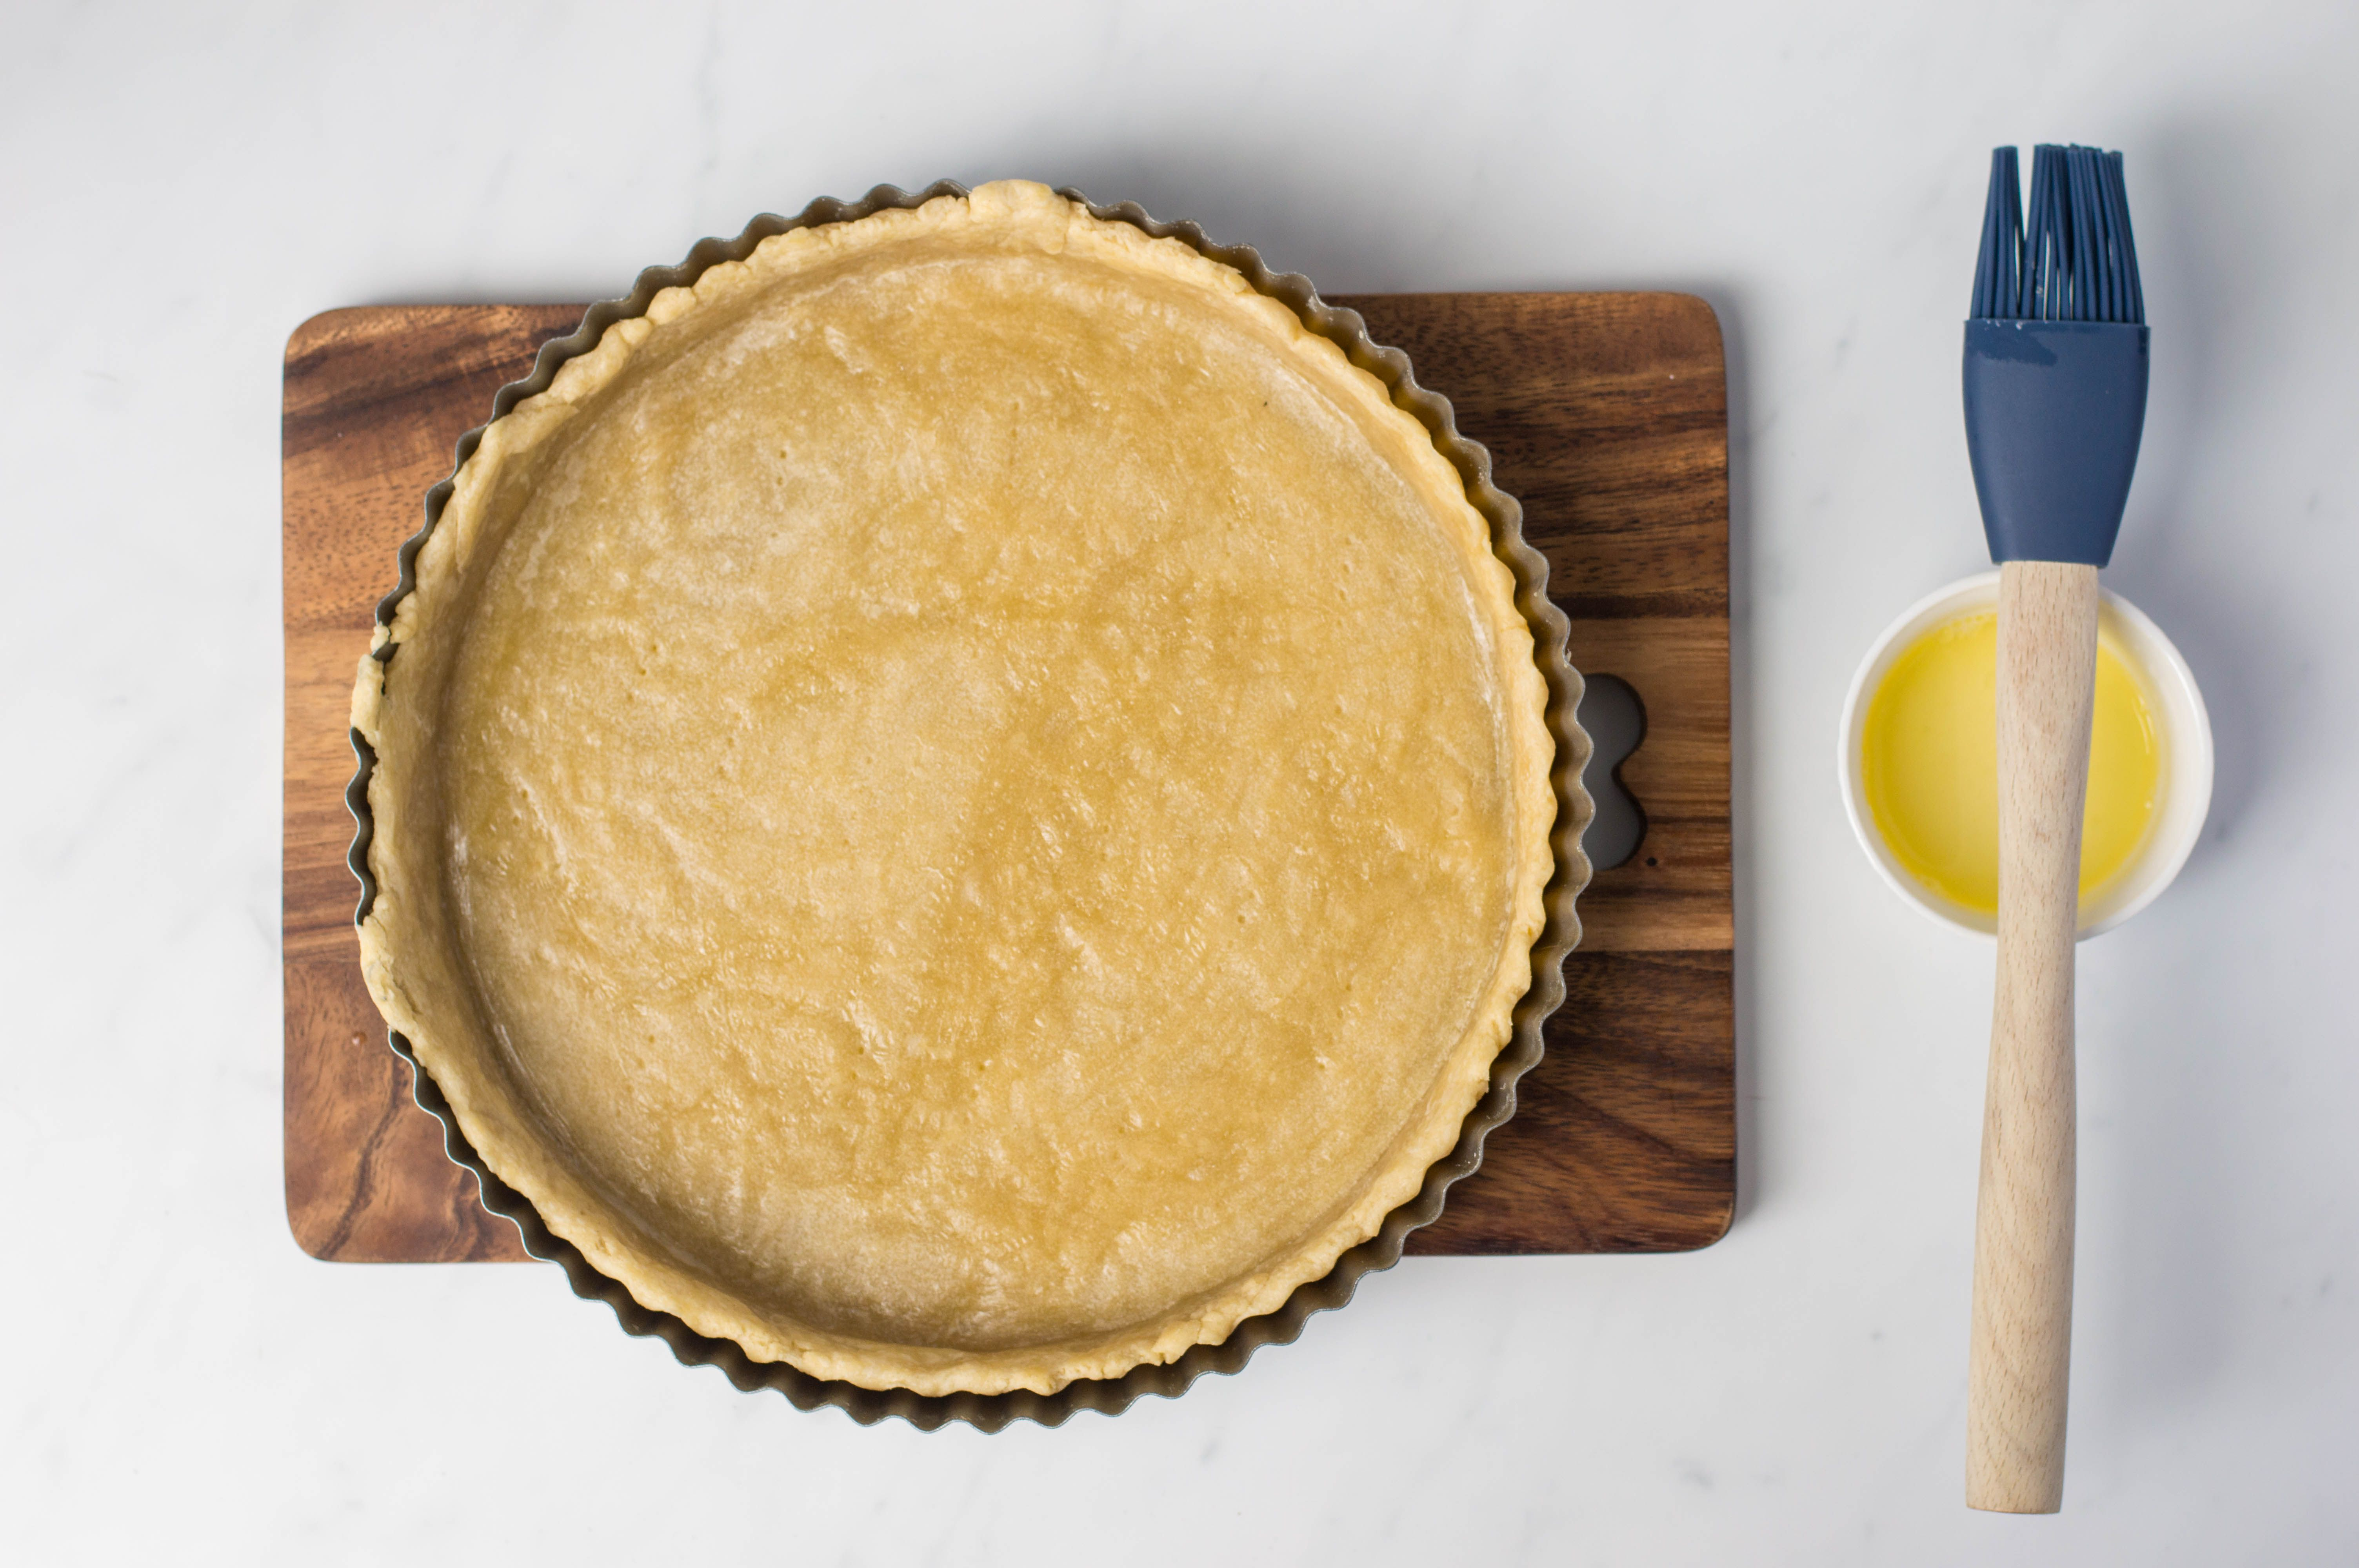 Tart crust with light egg wash